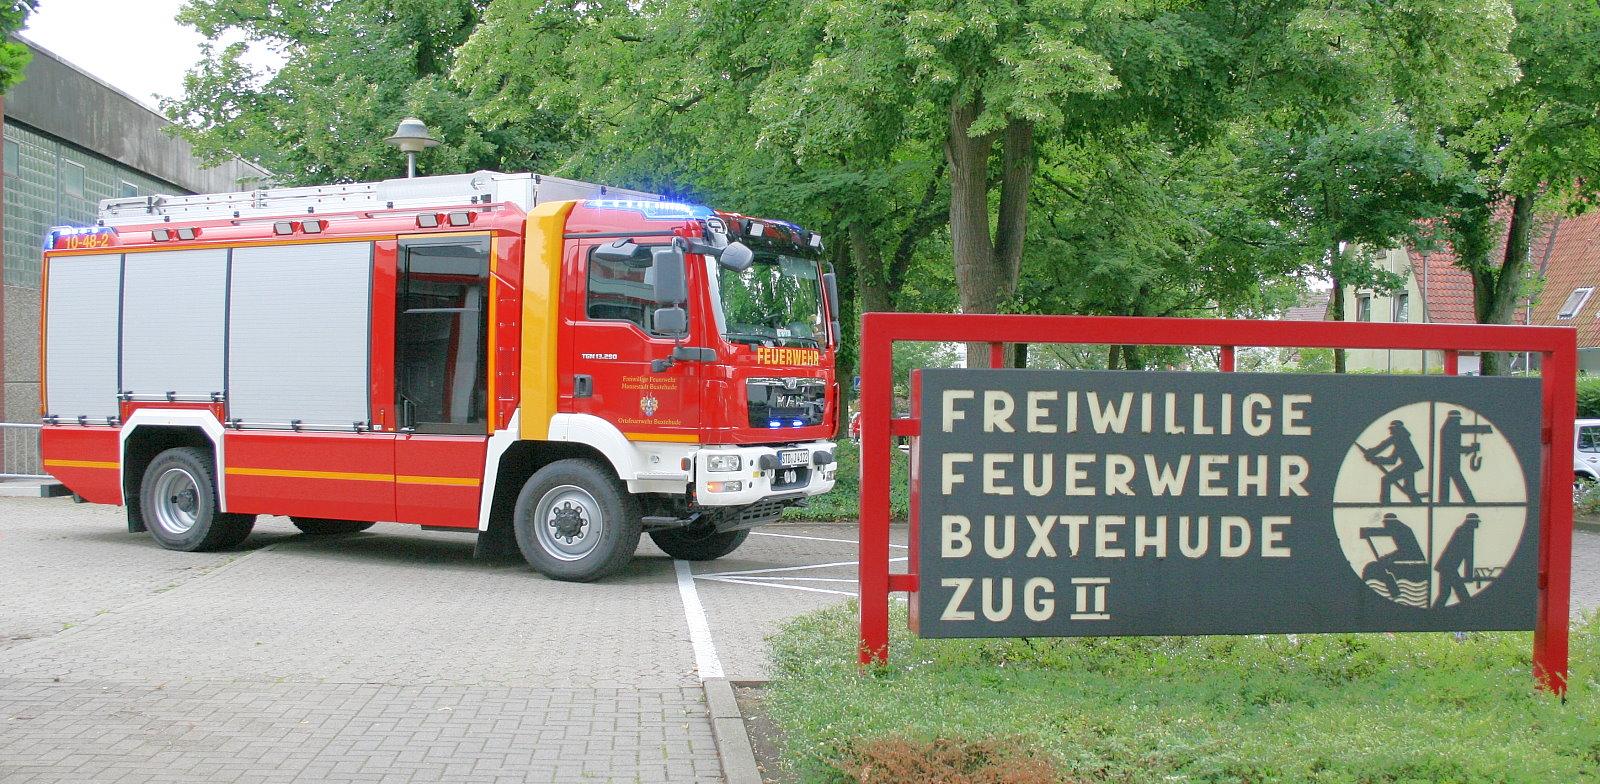 https://www.feuerwehr-buxtehude.de/media/img/bilder_ow_bu2/bilder_bu2_fa/hlf/005.JPG